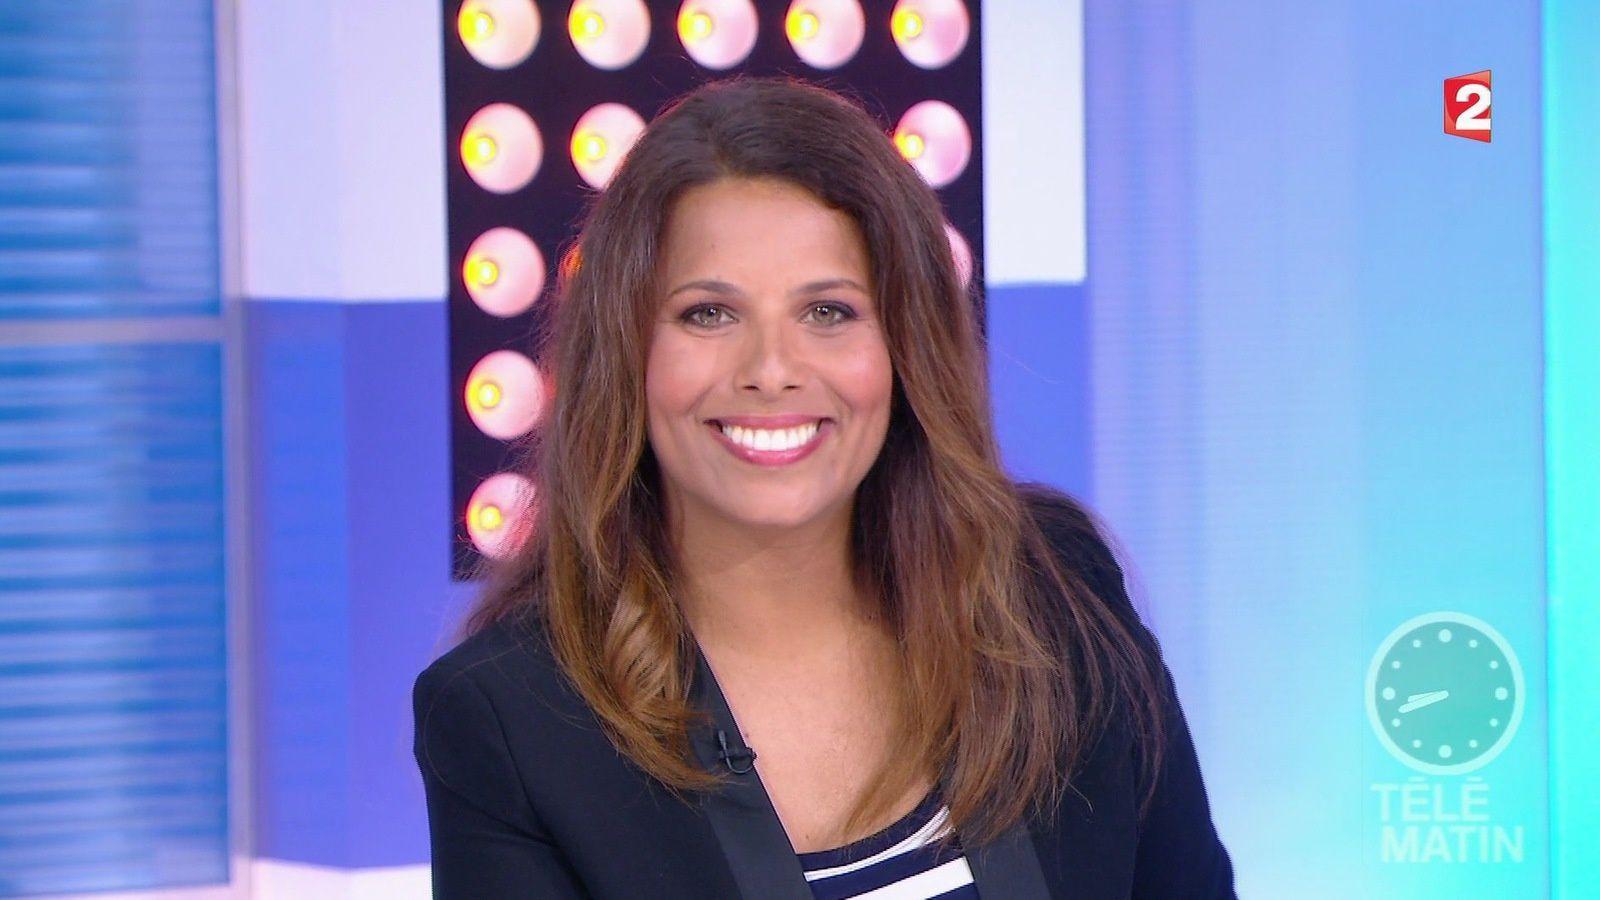 📸6 MYRIAM SEURAT ce matin dans TELEMATIN sur FRANCE 2 #vuesalatele